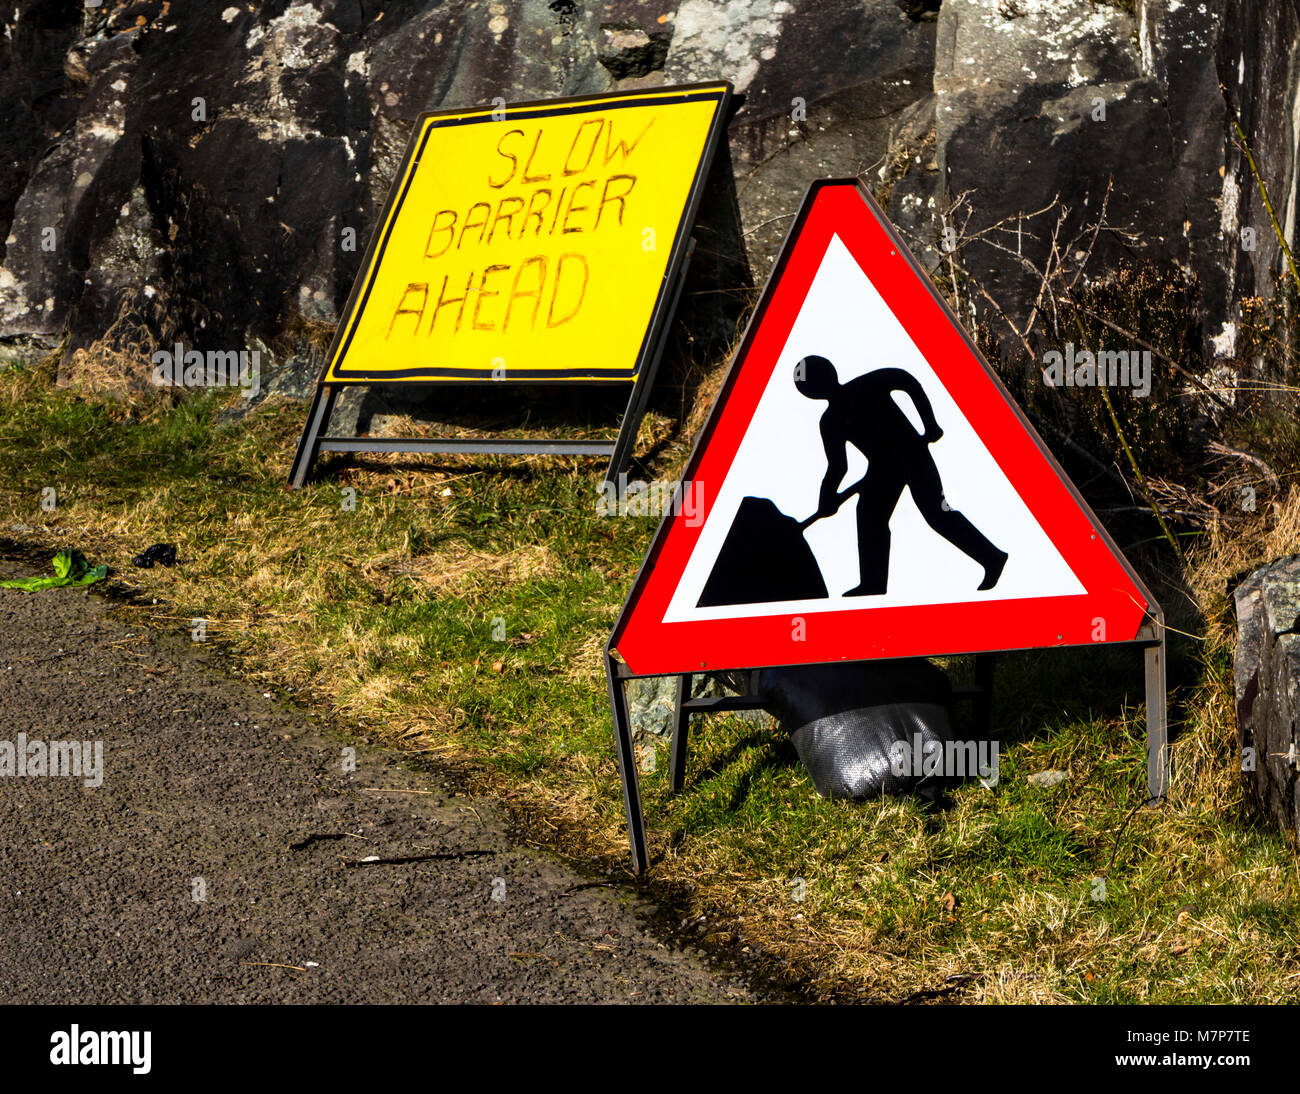 Triangular roadworks ahead warning sign, Scotland. Stock Photo